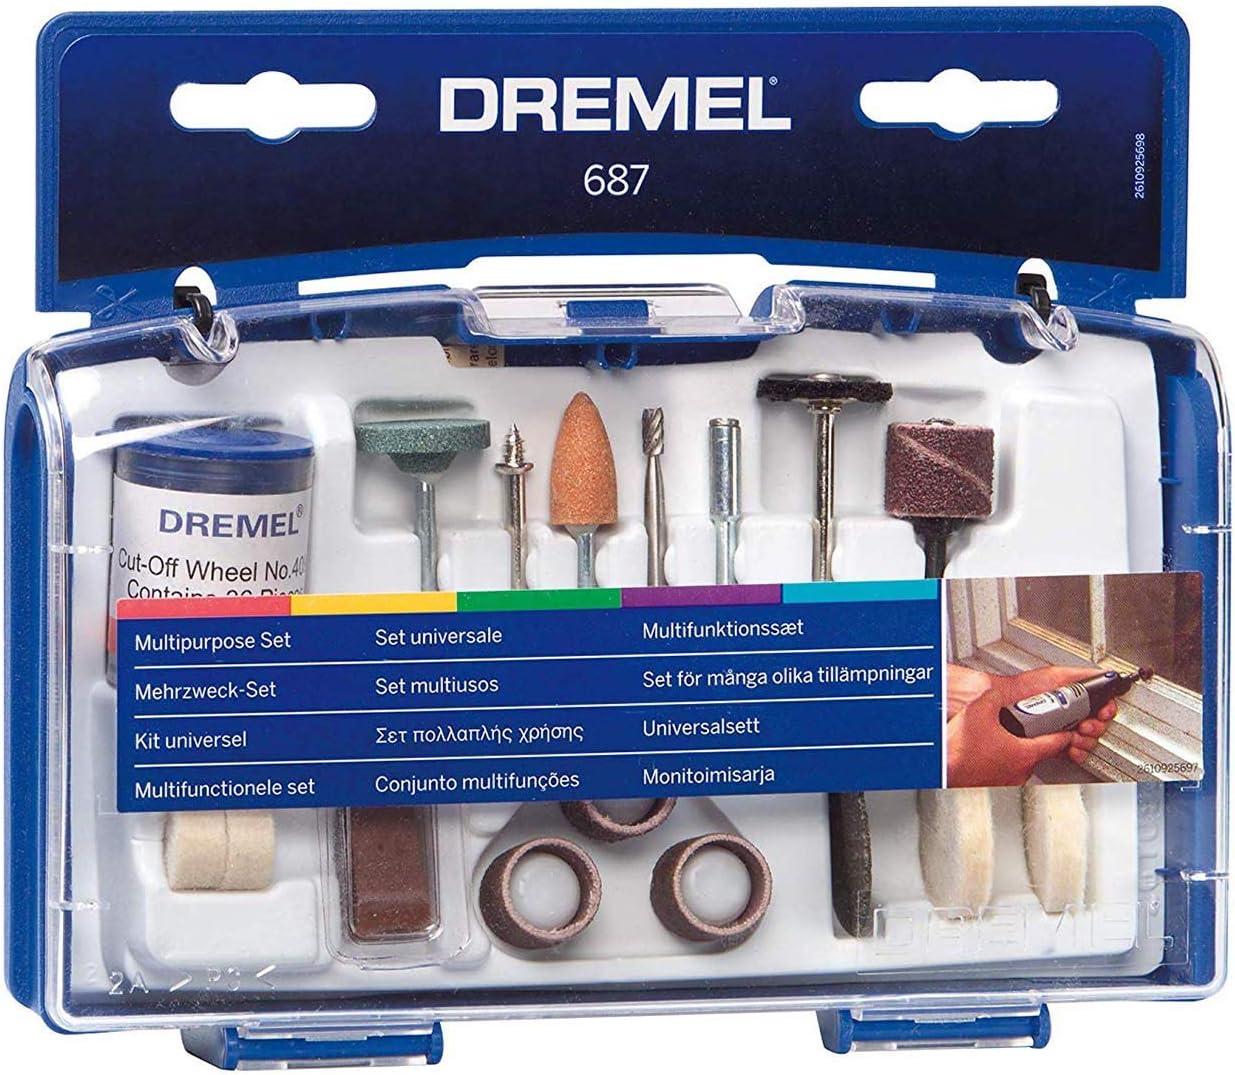 Pack of 1 Silver Dremel 687-01 52PC GP Set